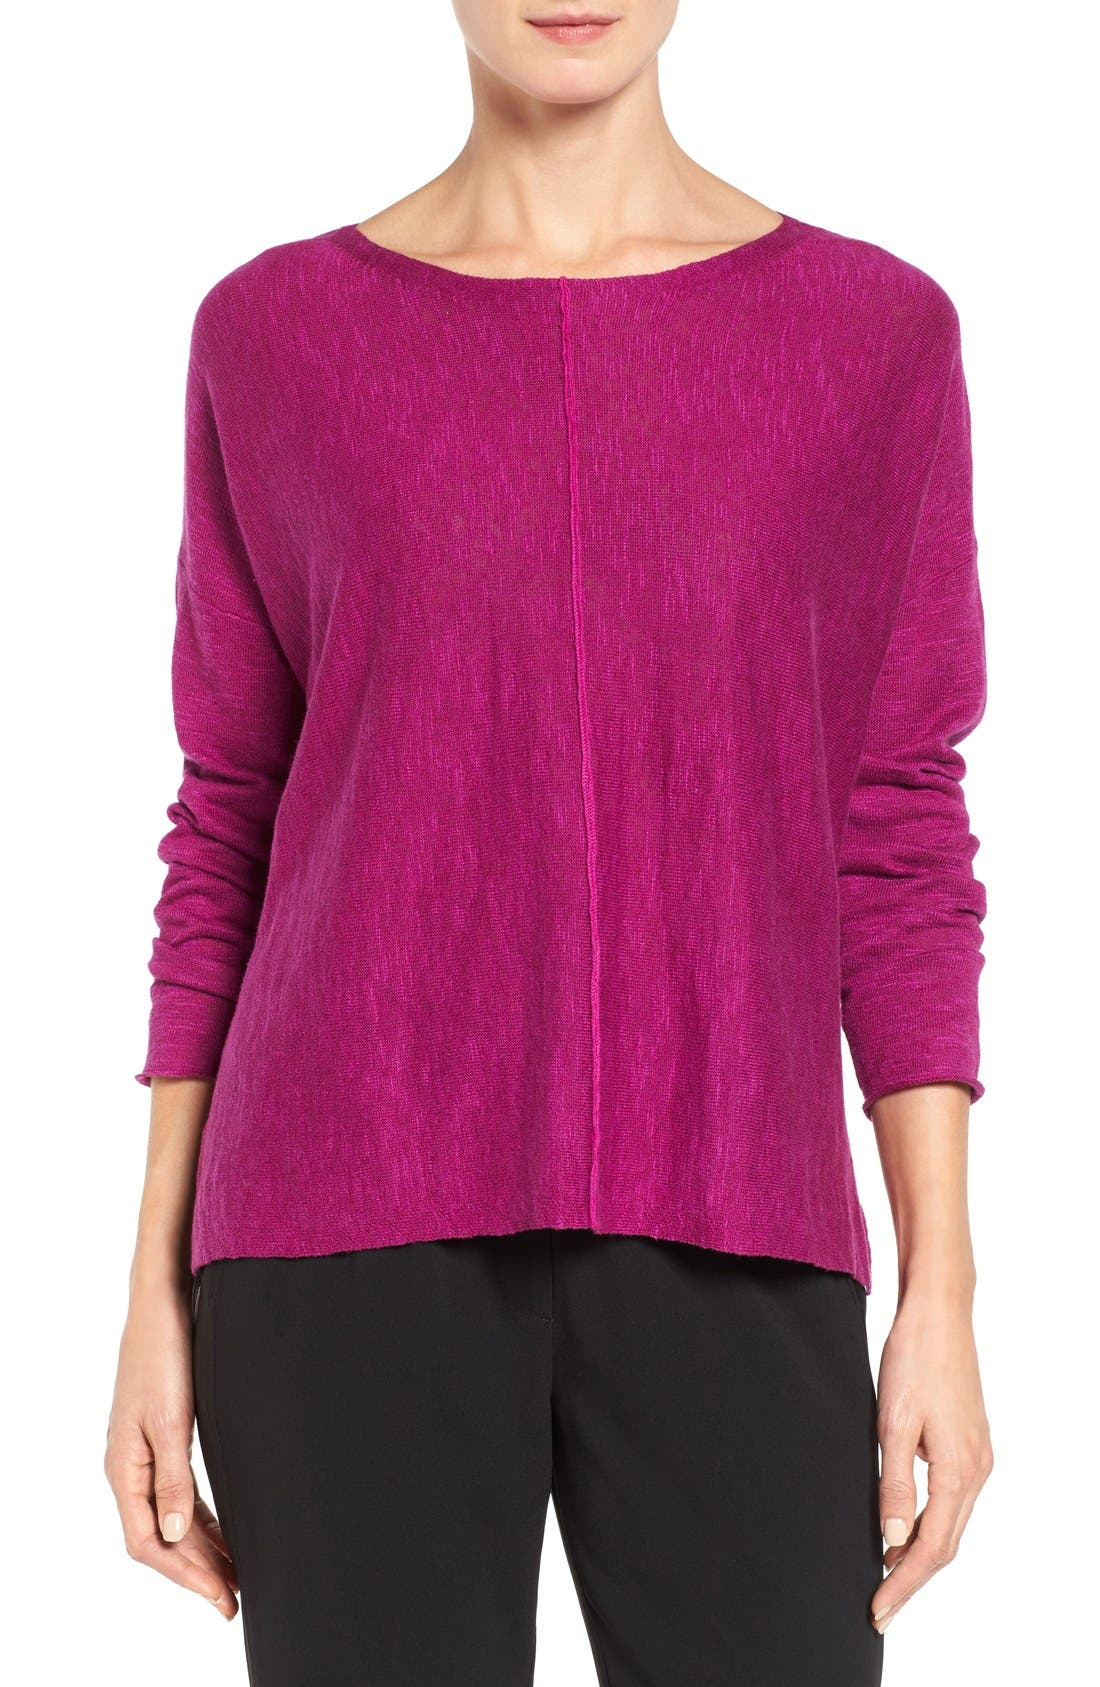 Alternate Image 1 Selected - Eileen Fisher Organic Linen & Cotton Top (Regular & Petite)